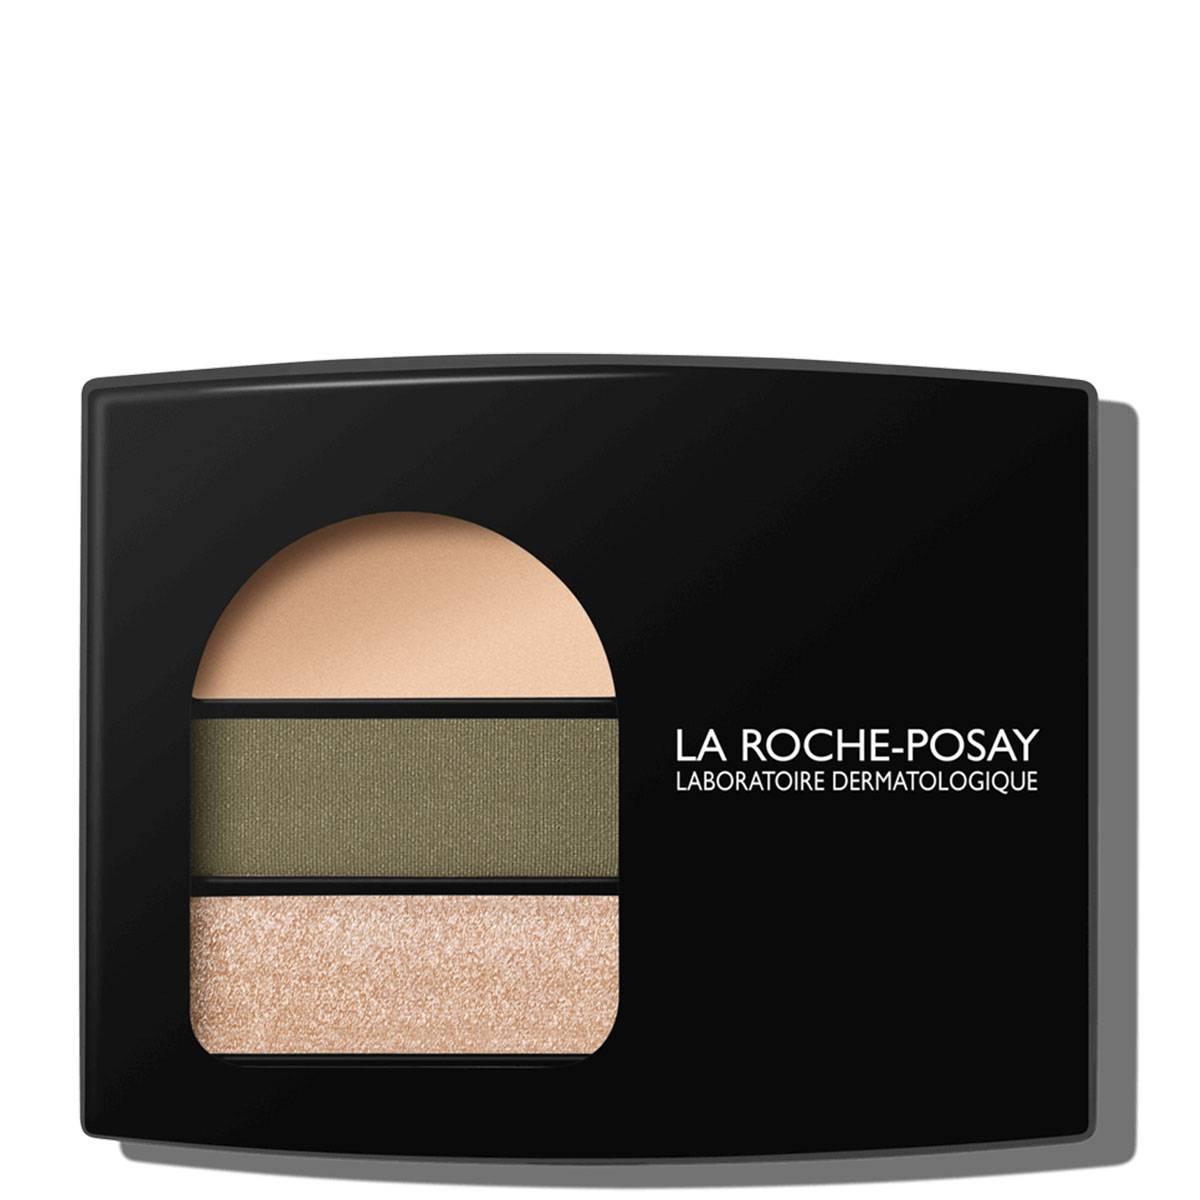 La Roche Posay Herkkä Toleriane Make up EYE SHADOW DuoSmokyVert 333